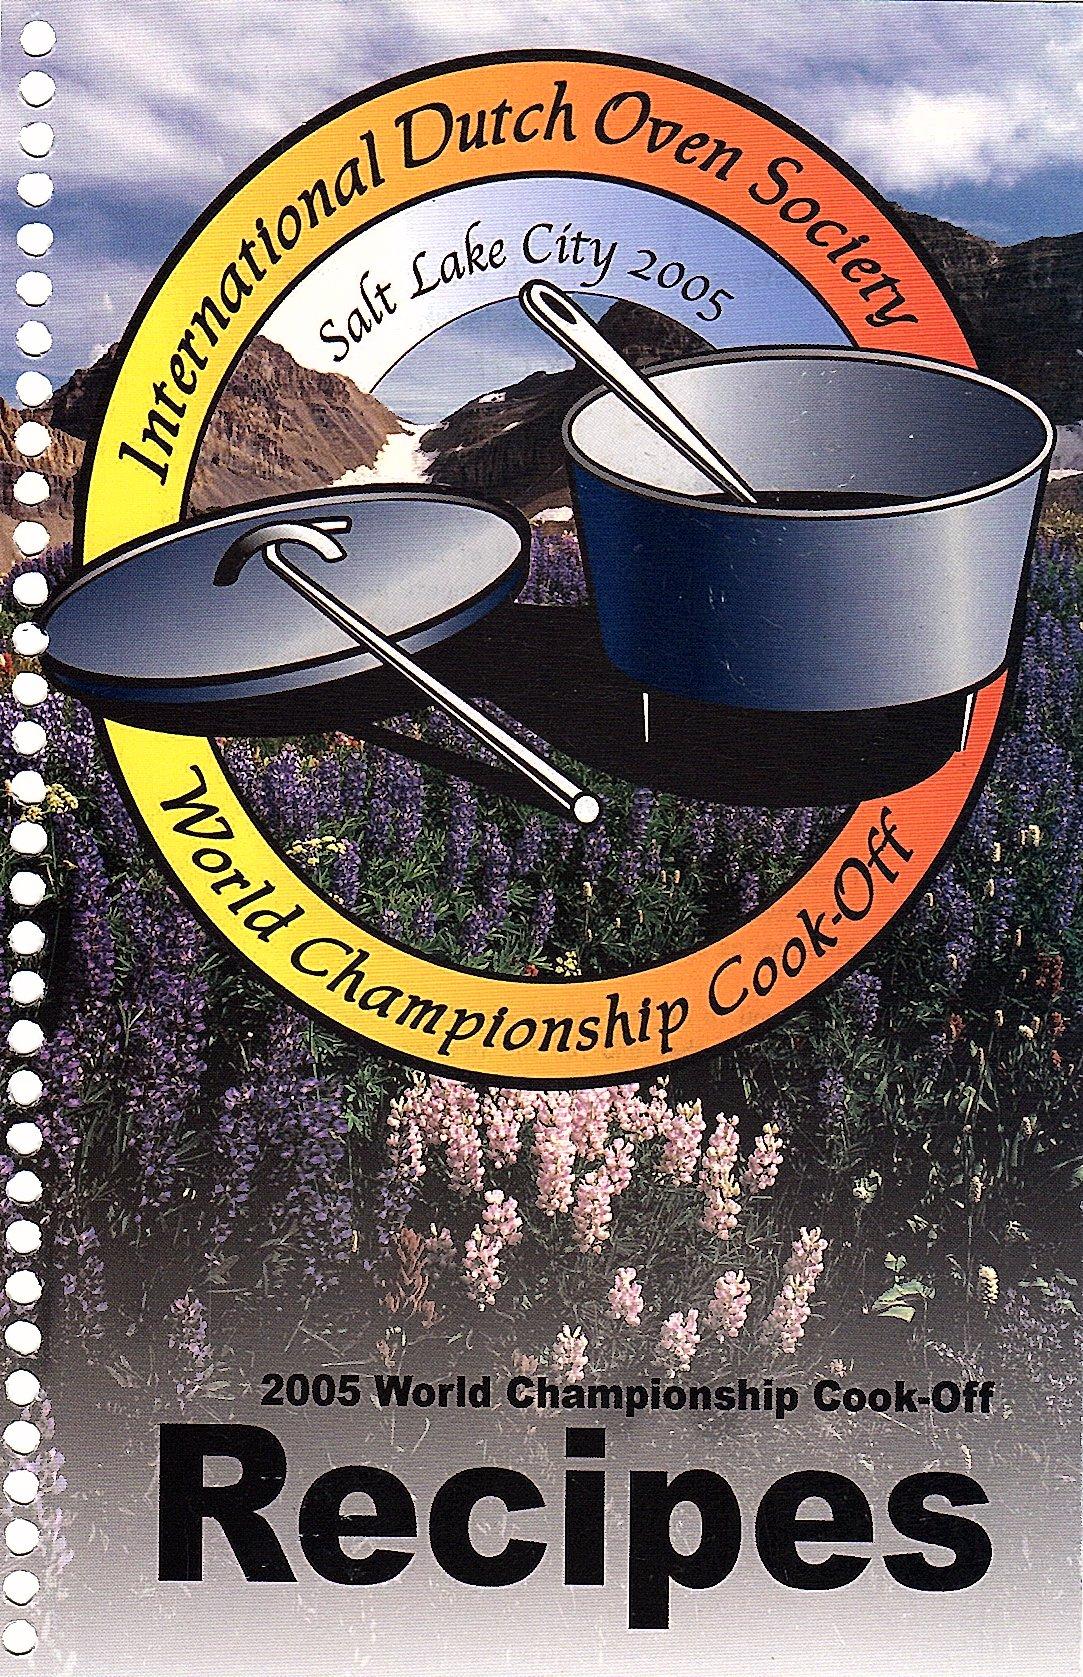 IDOS 2005 World Championship Cook Off PDF Recipes